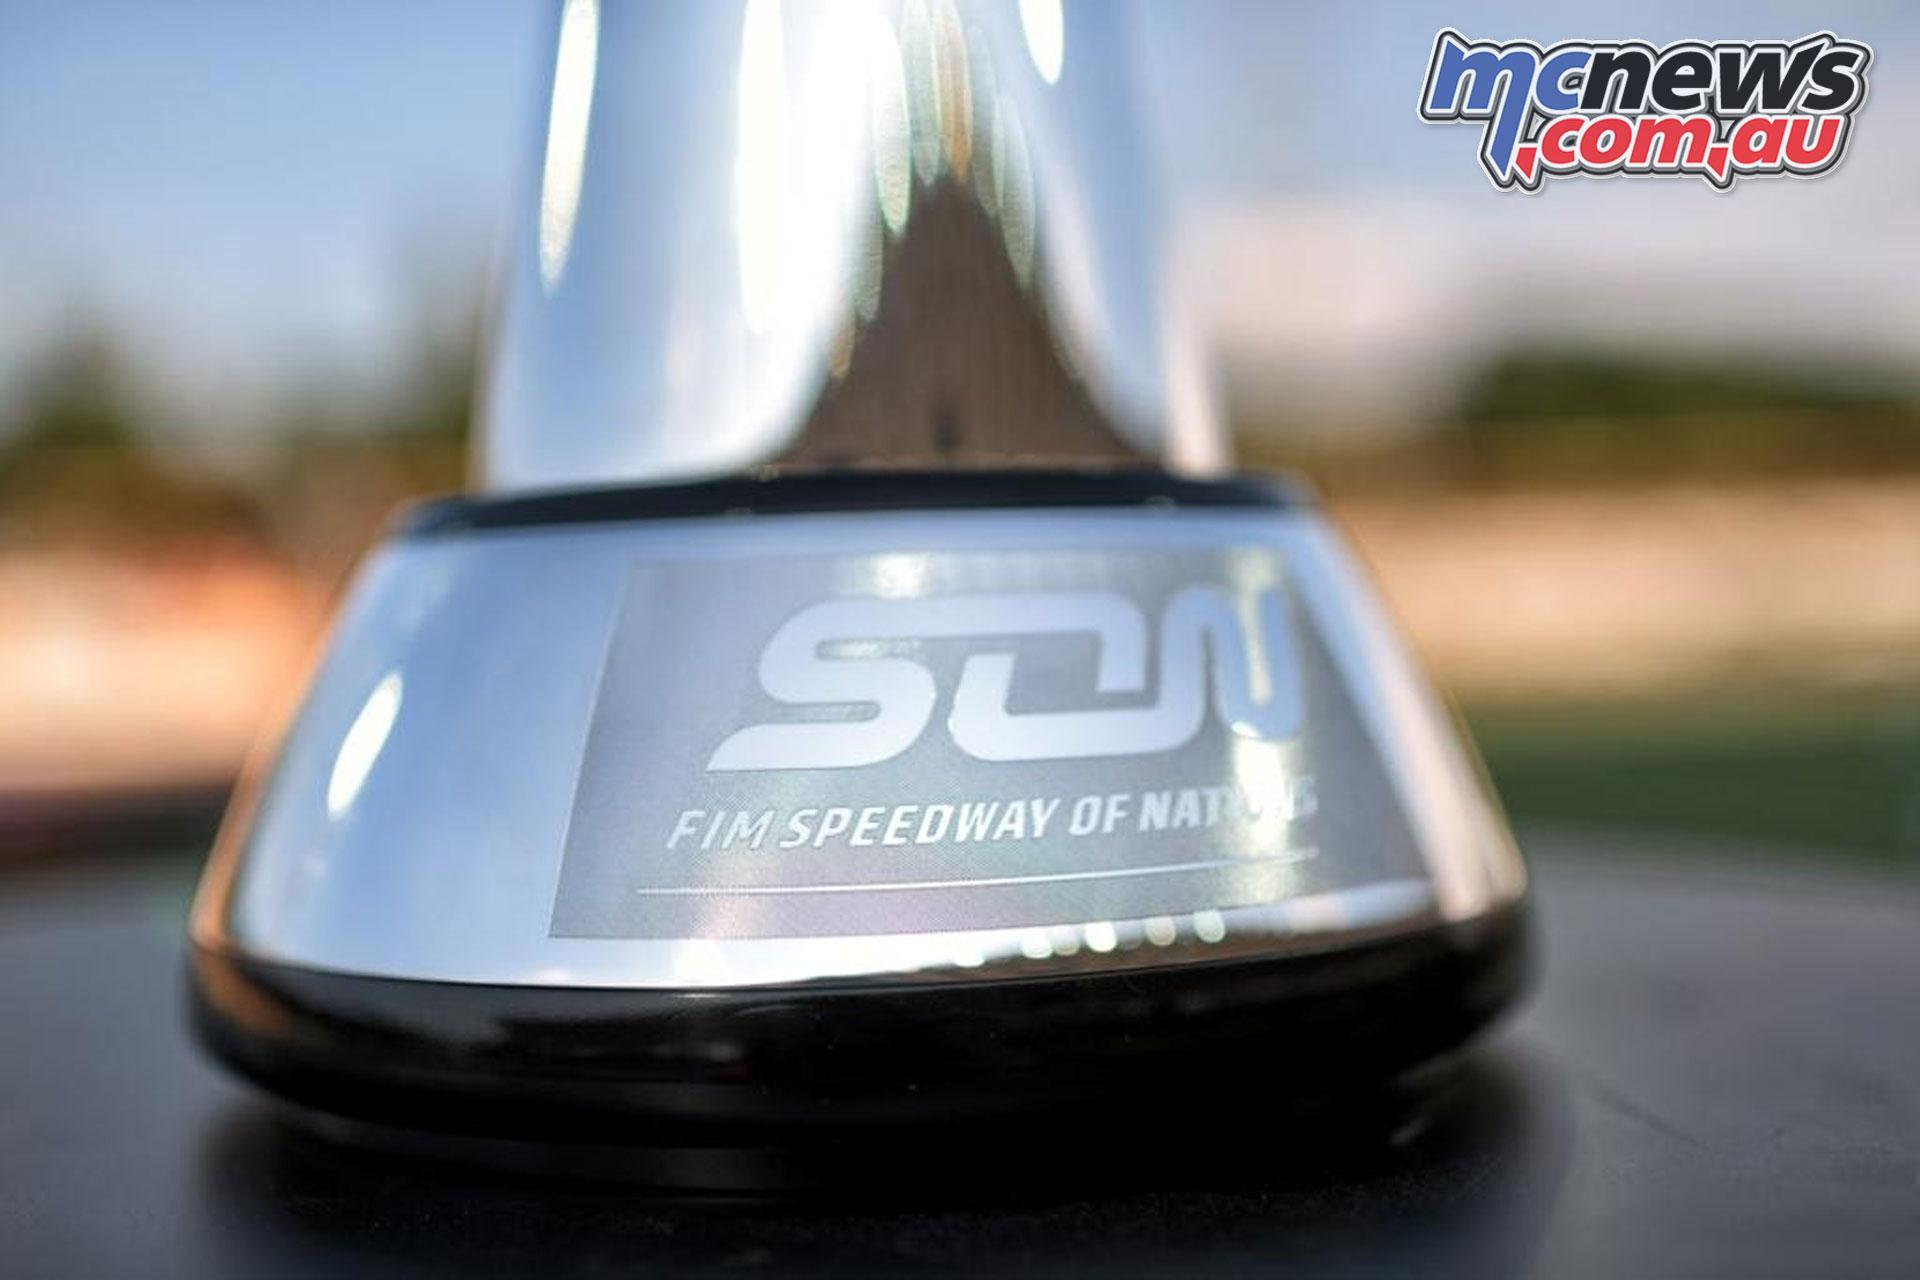 FIM Speedway of Nations